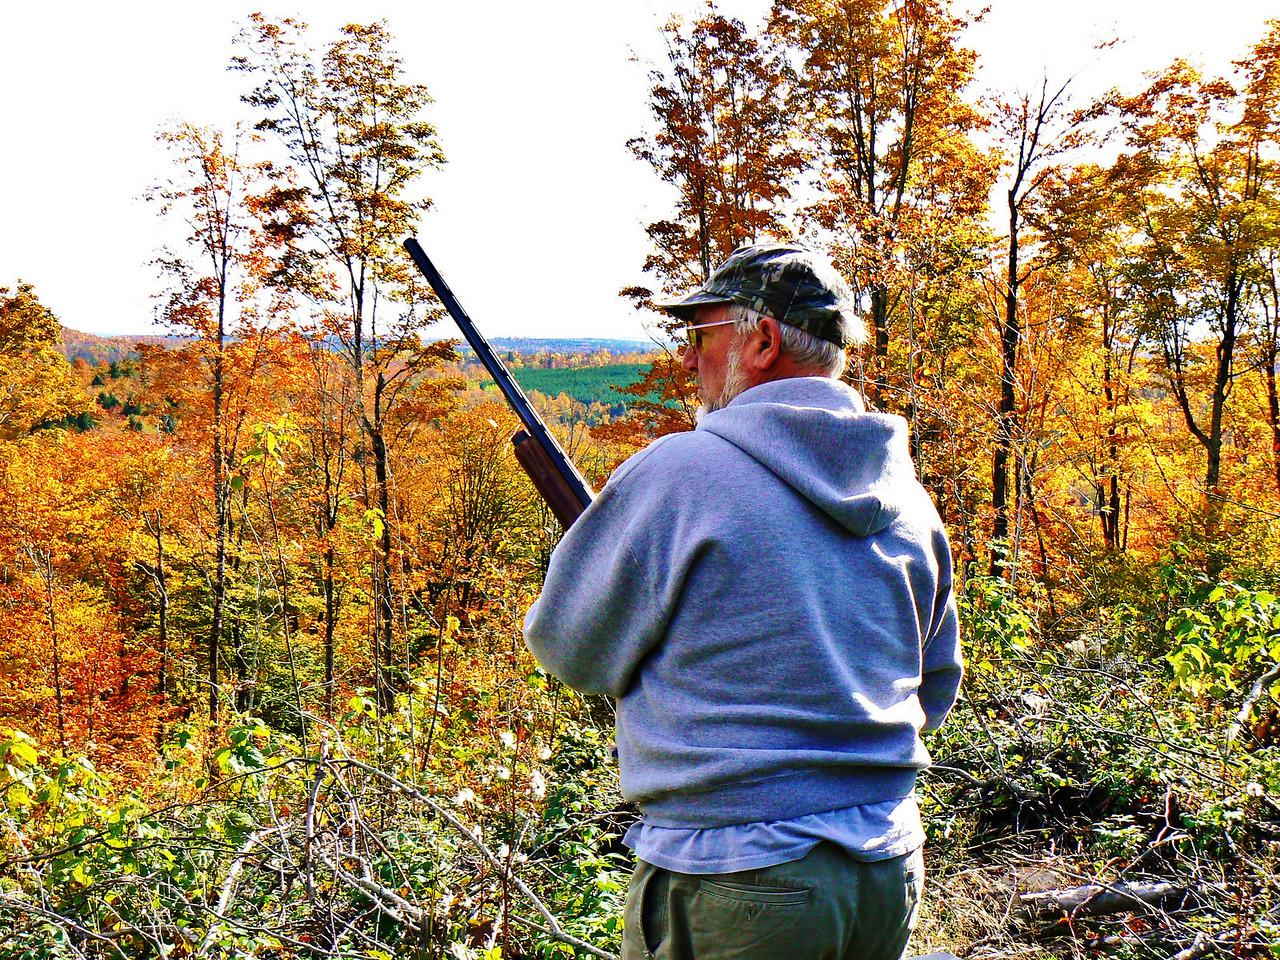 Sunday AM 270 clay birds to shoot. Dave's ready